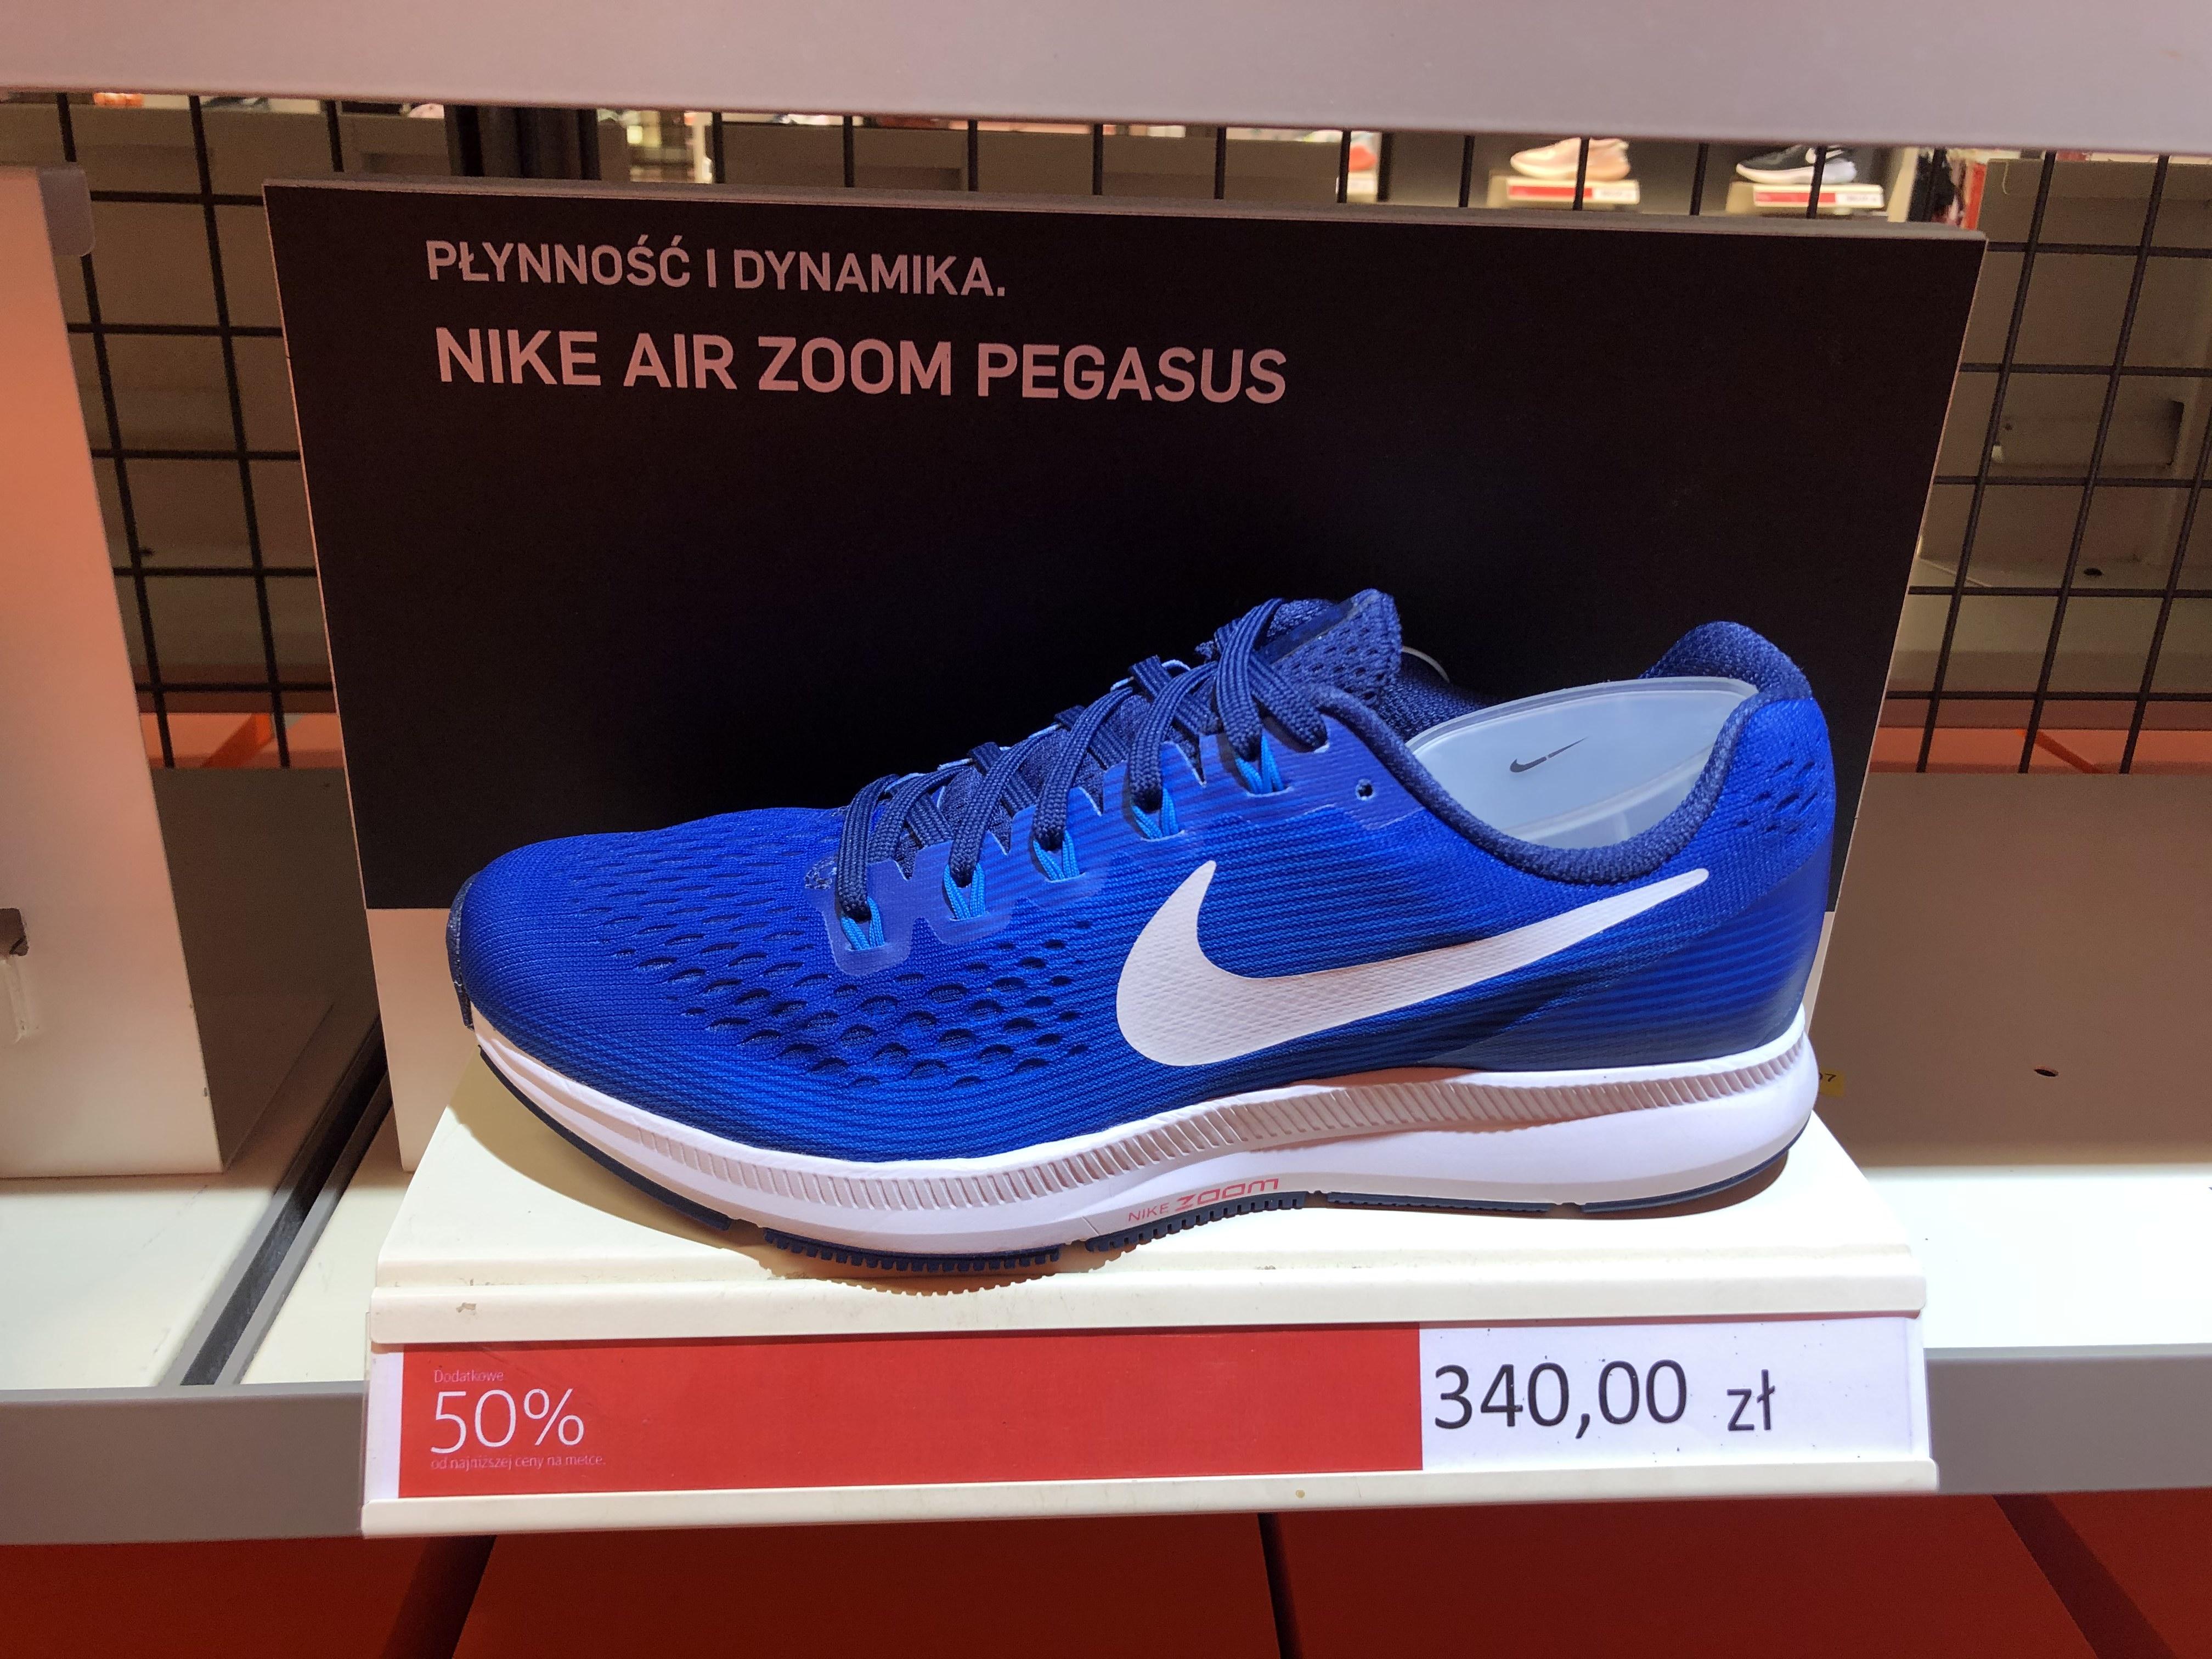 Buty Nike Air Zoom Pegasus 34